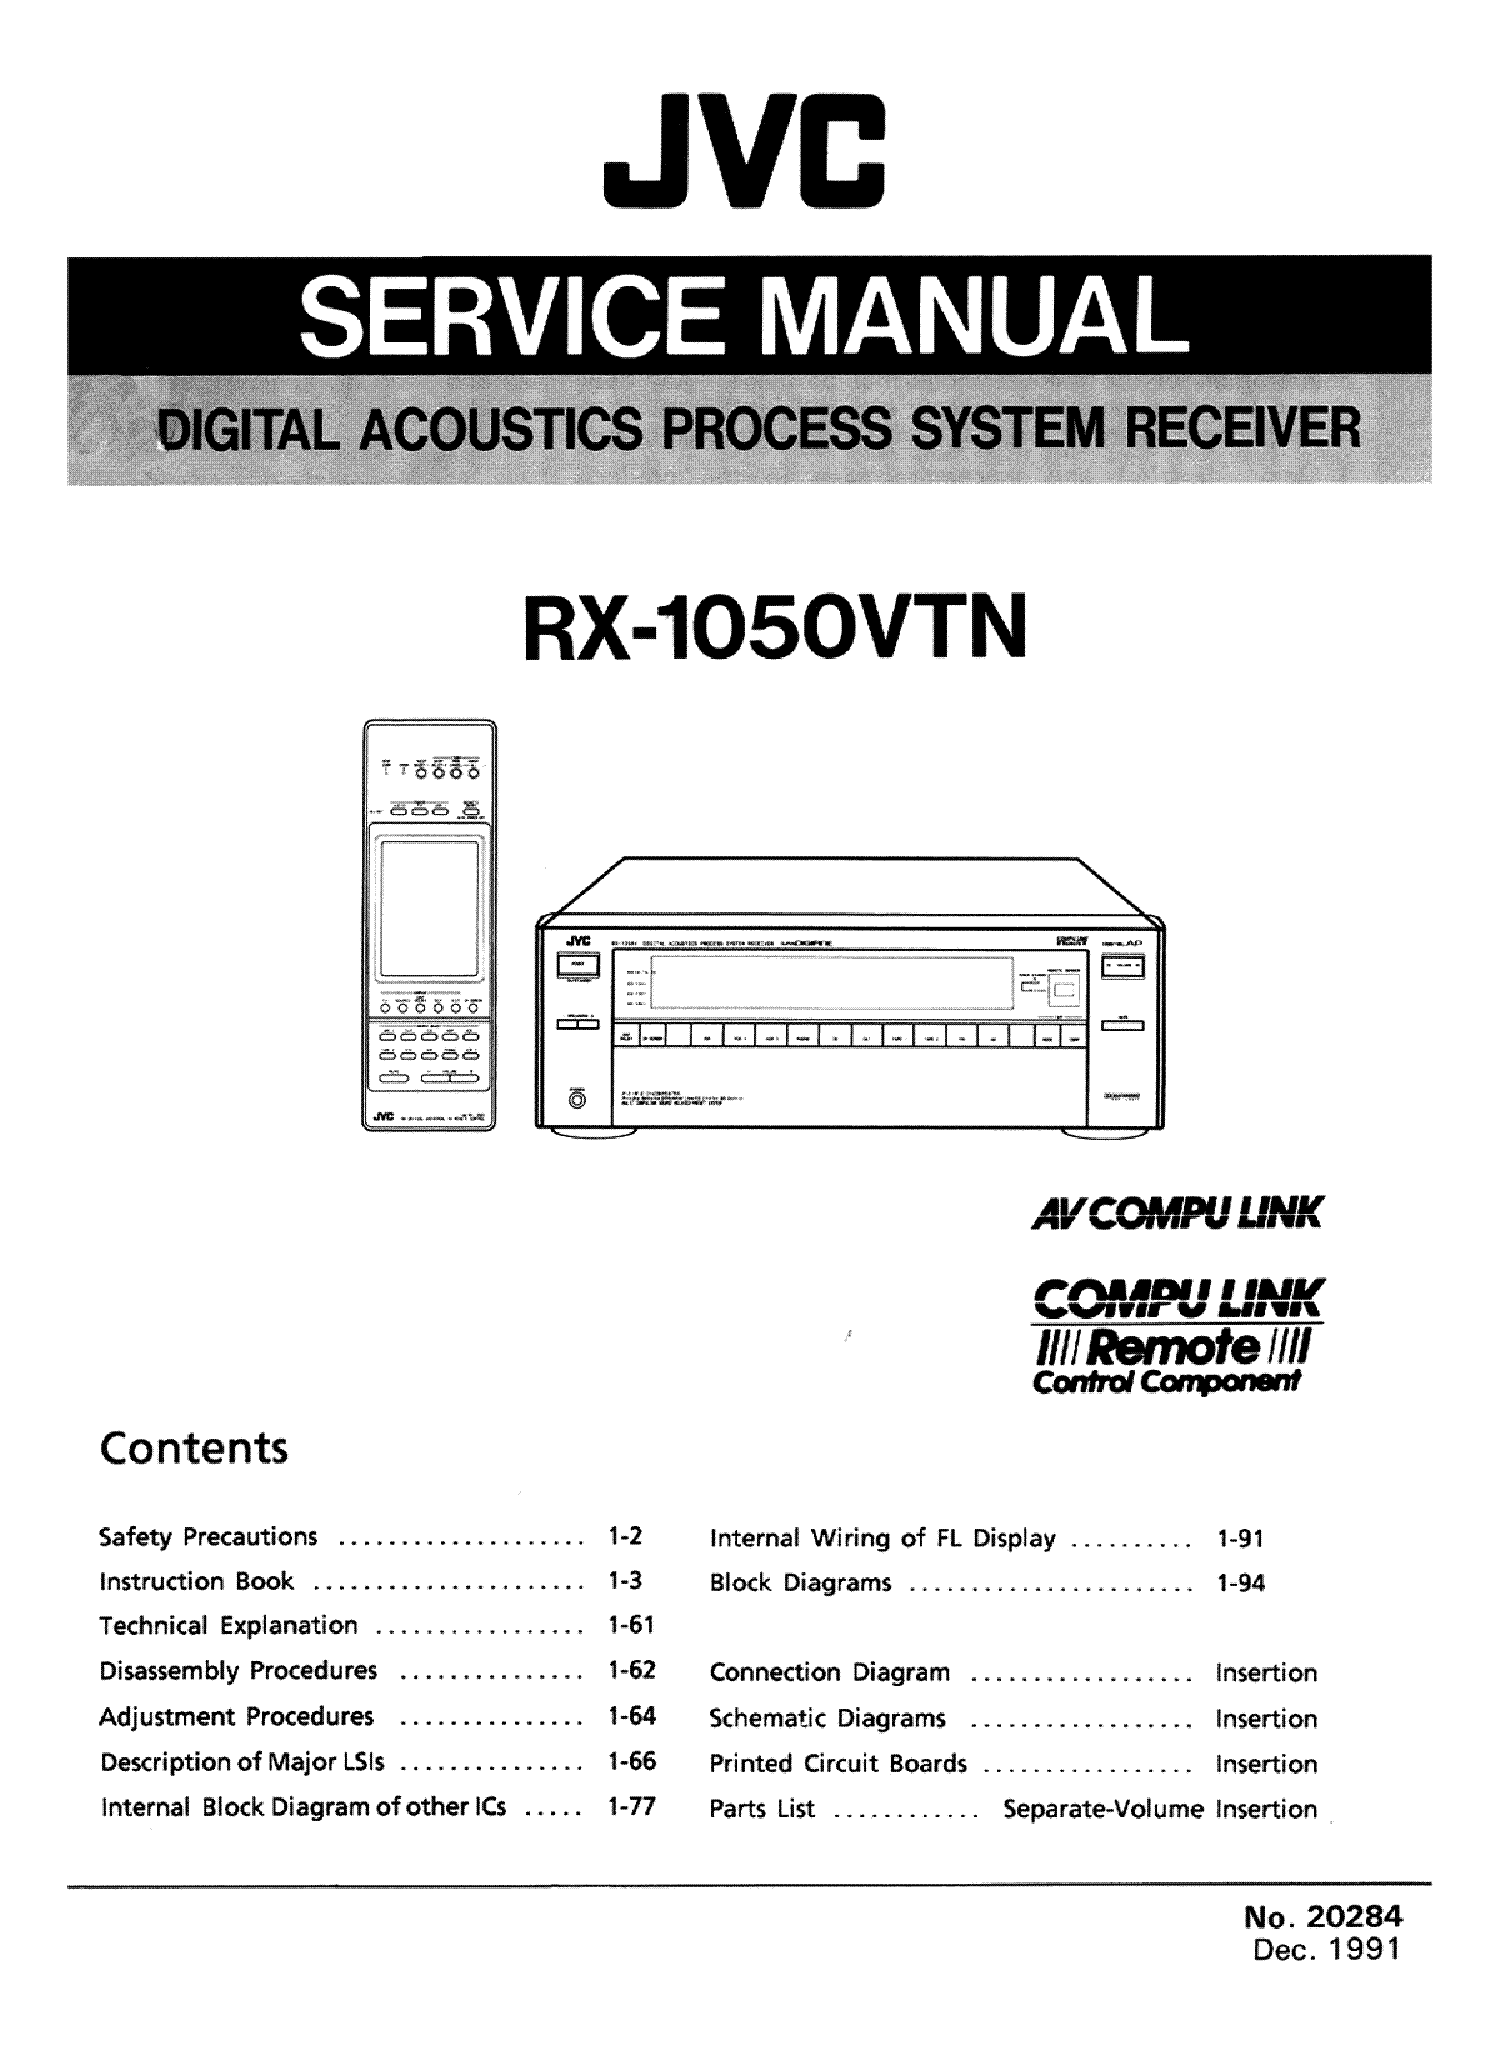 Jvc Rx 1050vtn Sm Service Manual Download Schematics Eeprom Schematic Diagram 1st Page